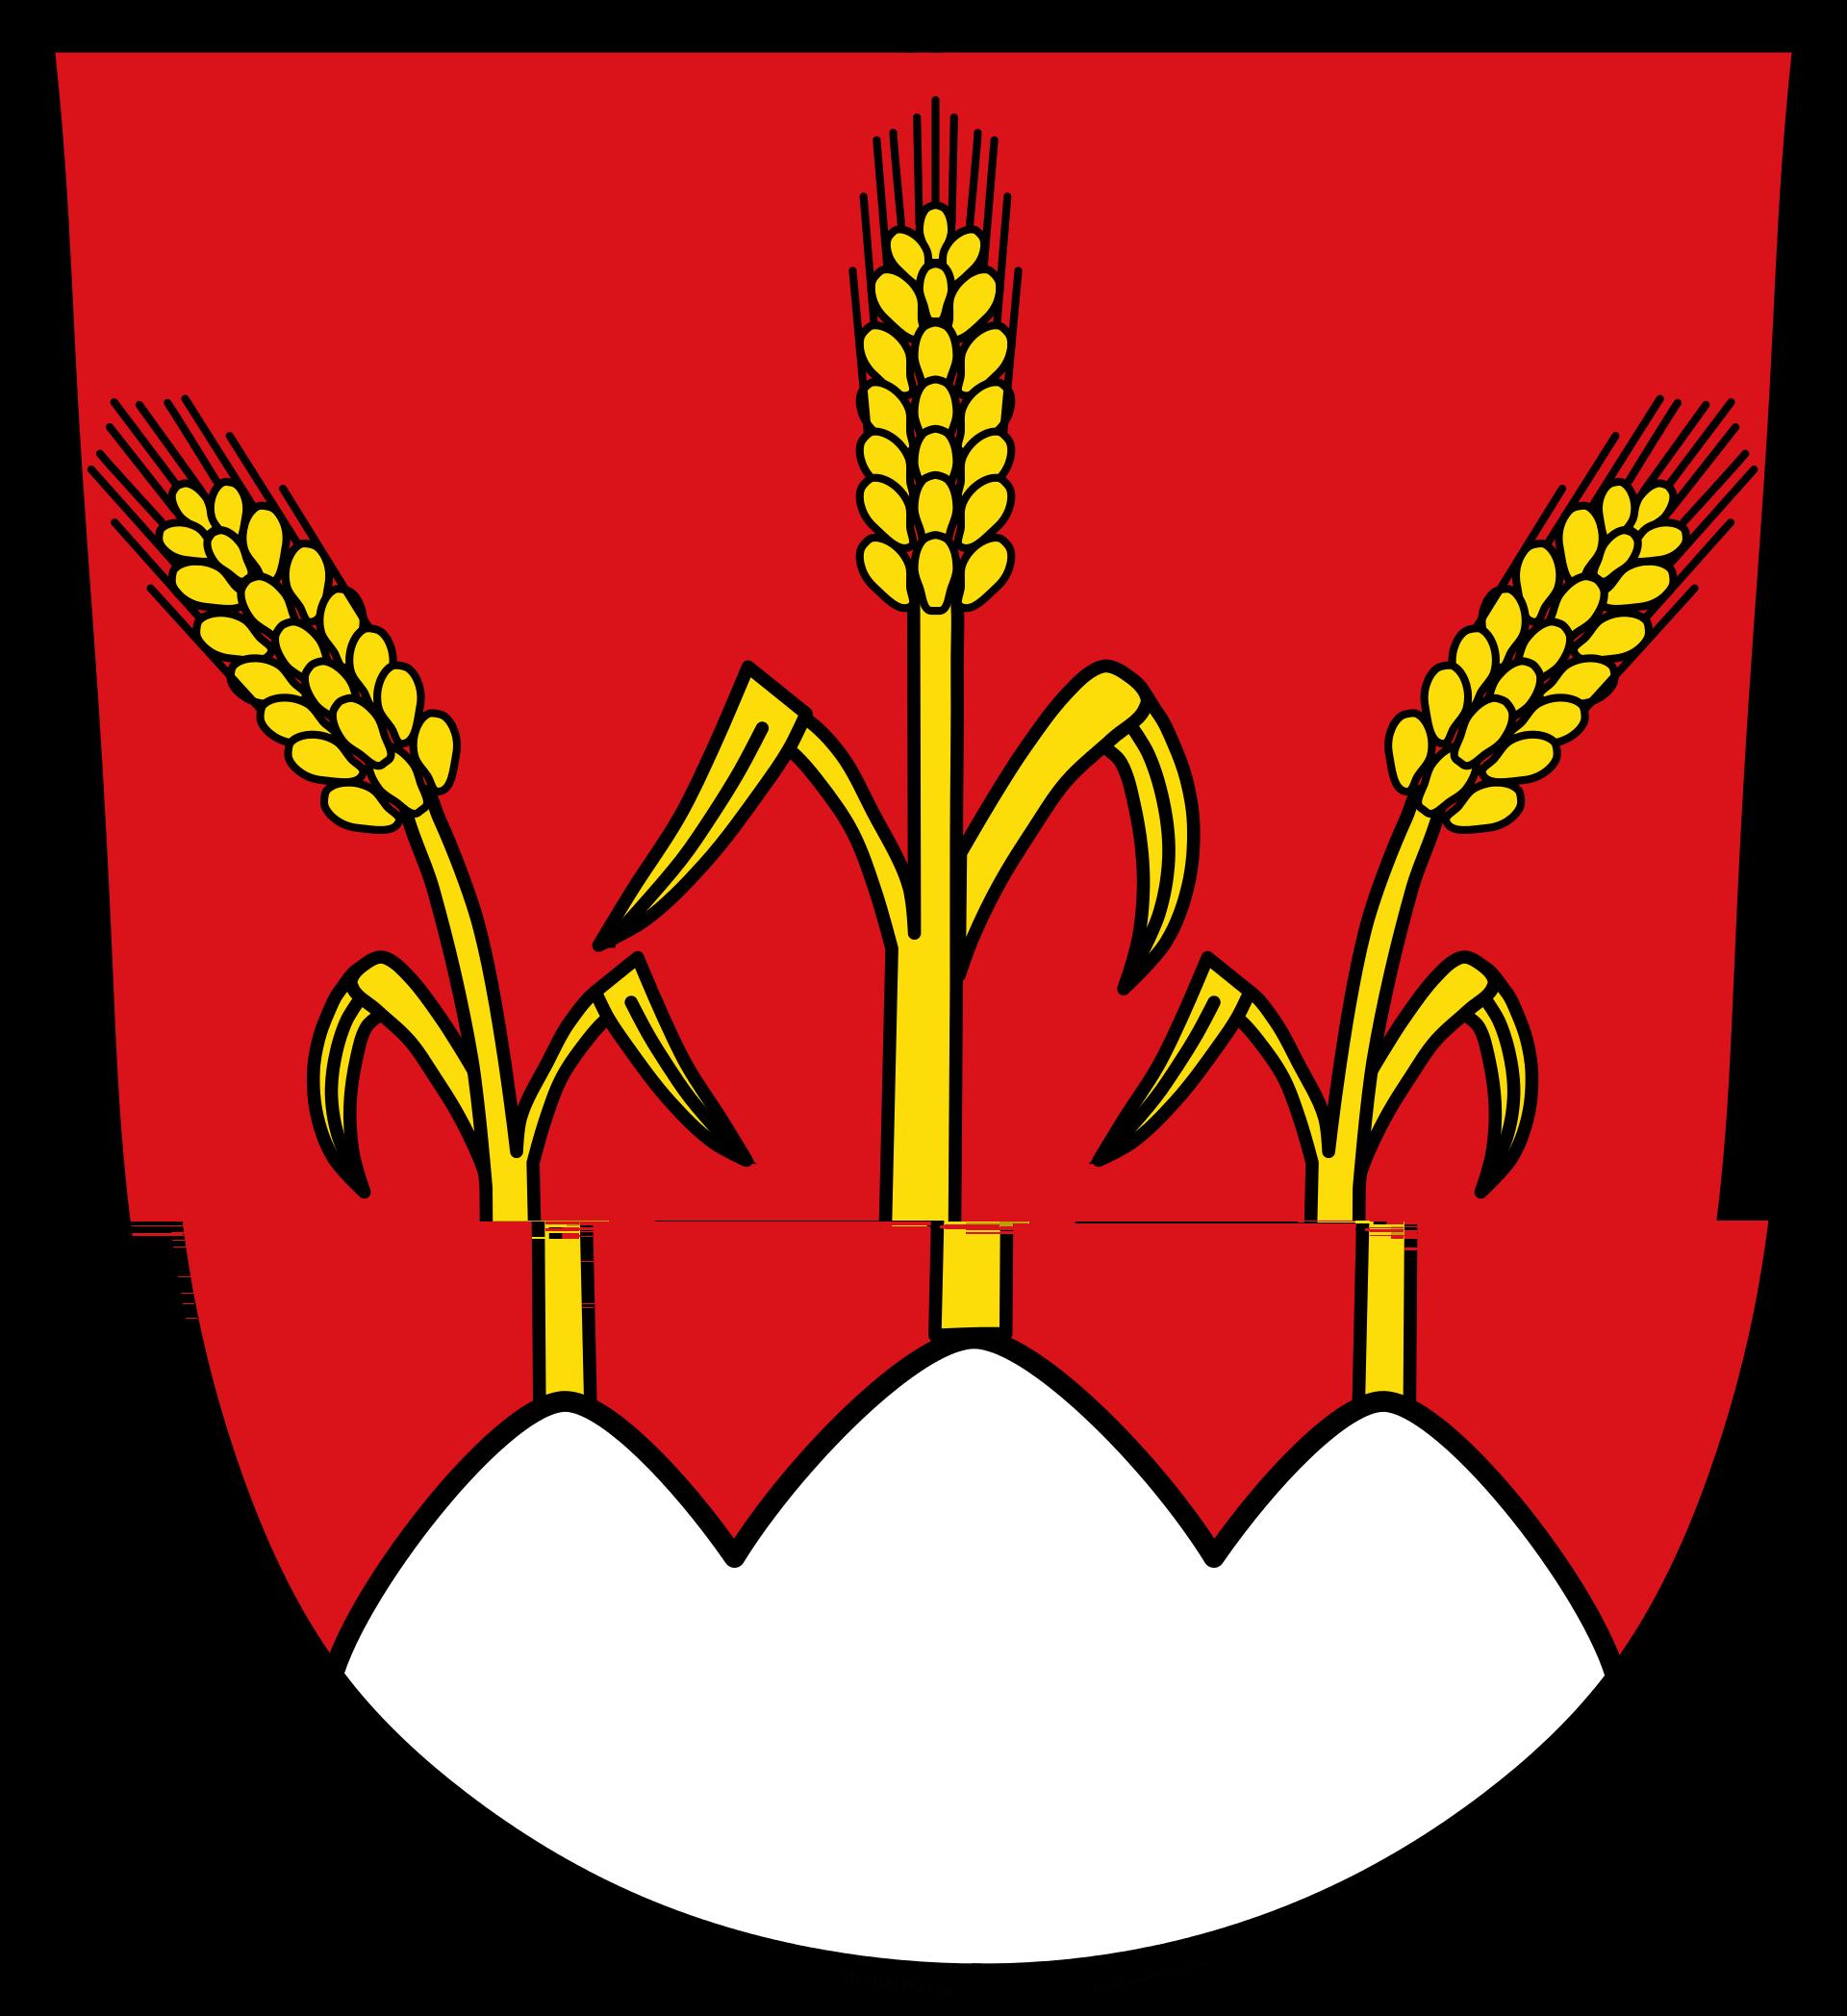 Wappen der Stadt Dinkelsbühl